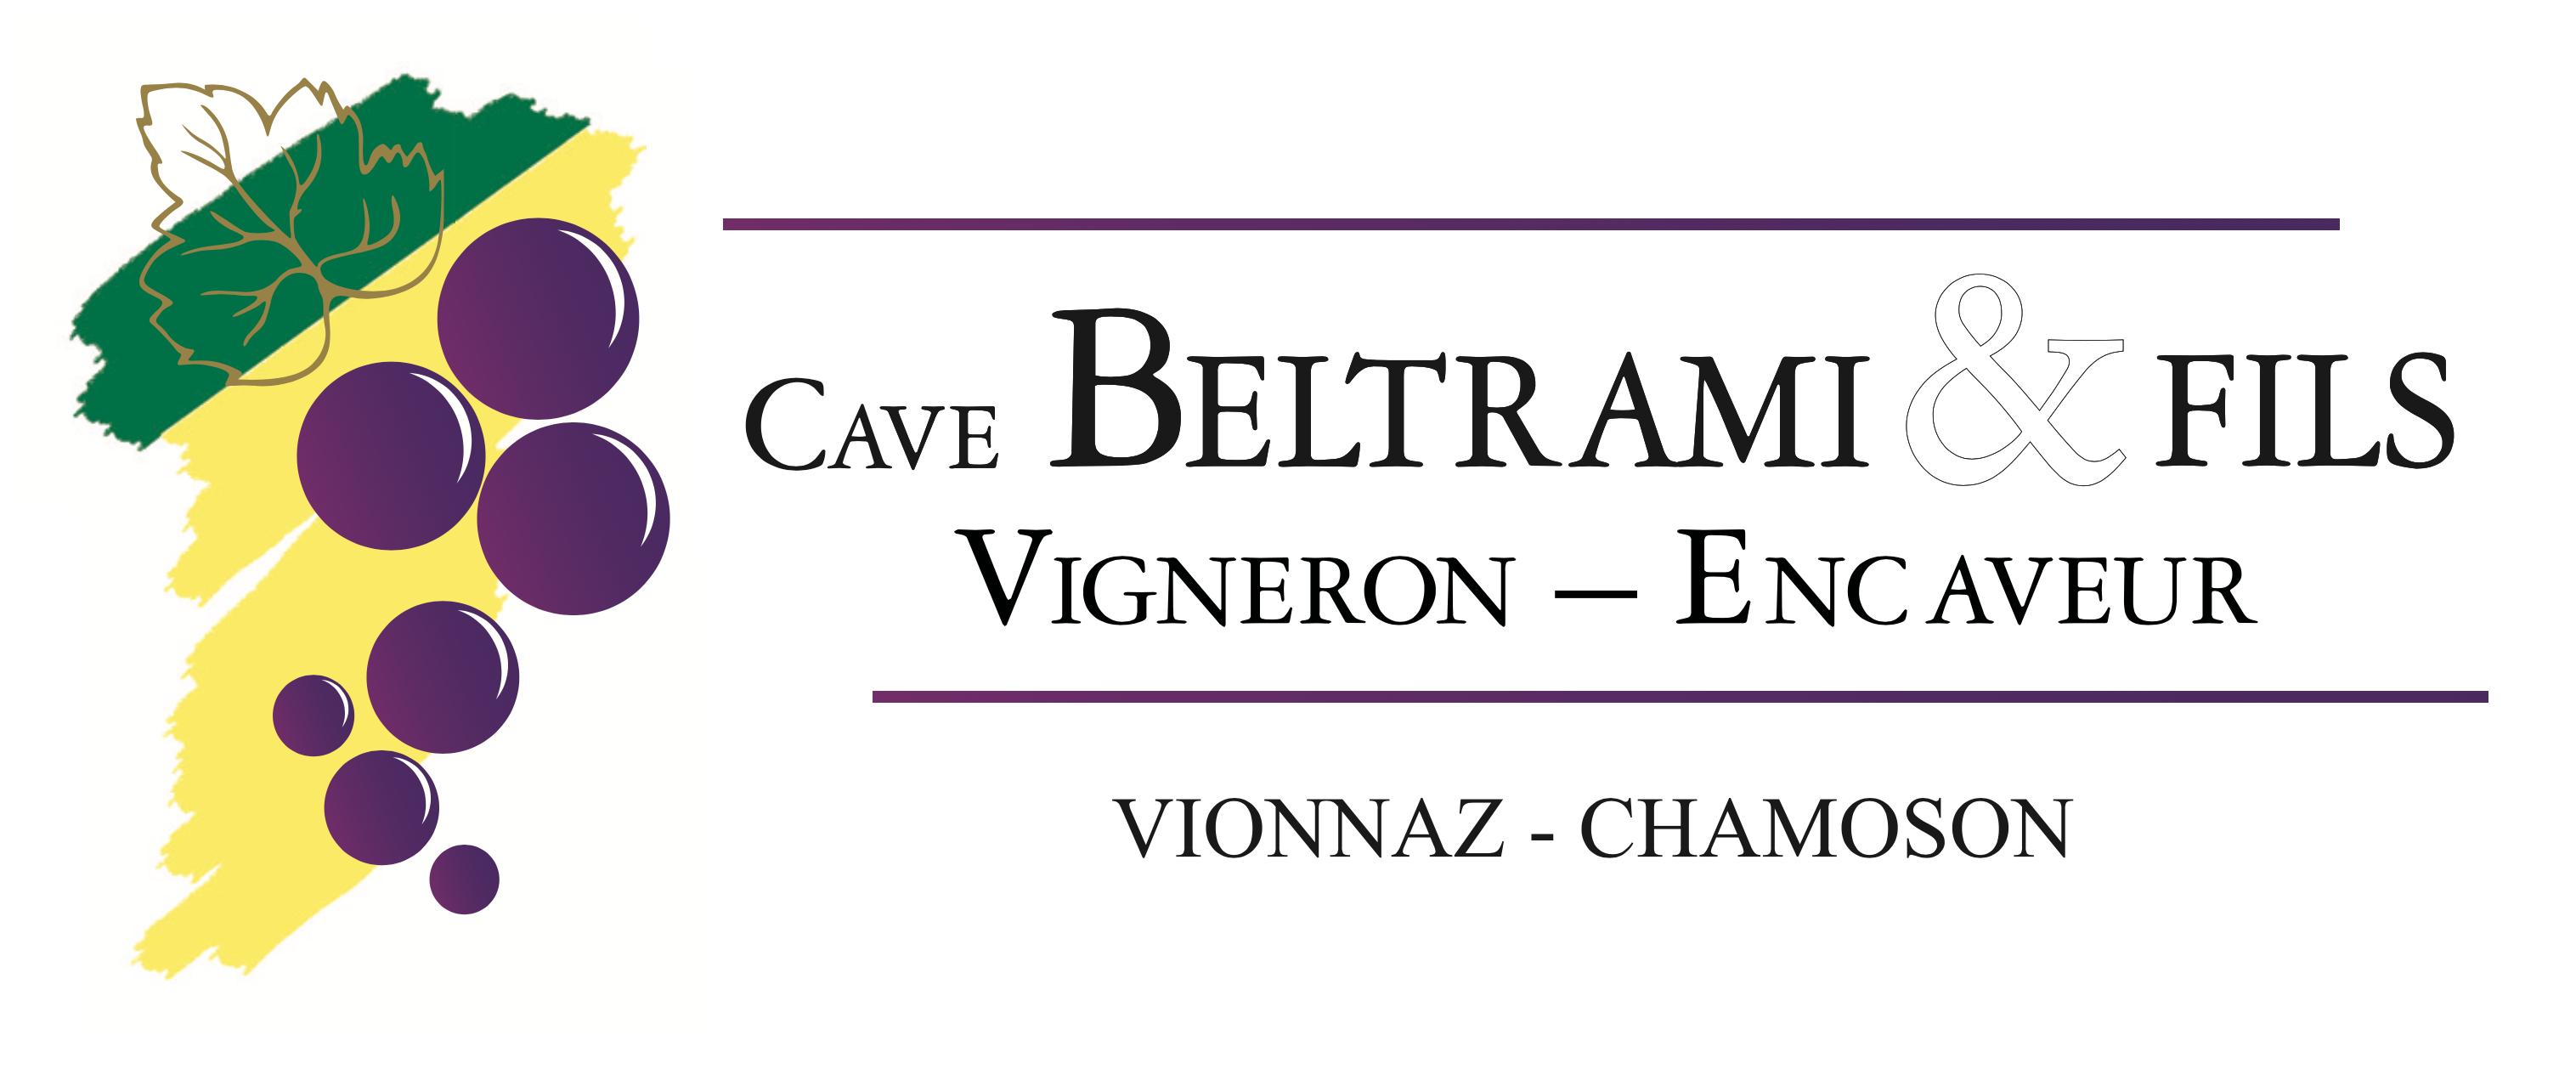 Cave Beltrami